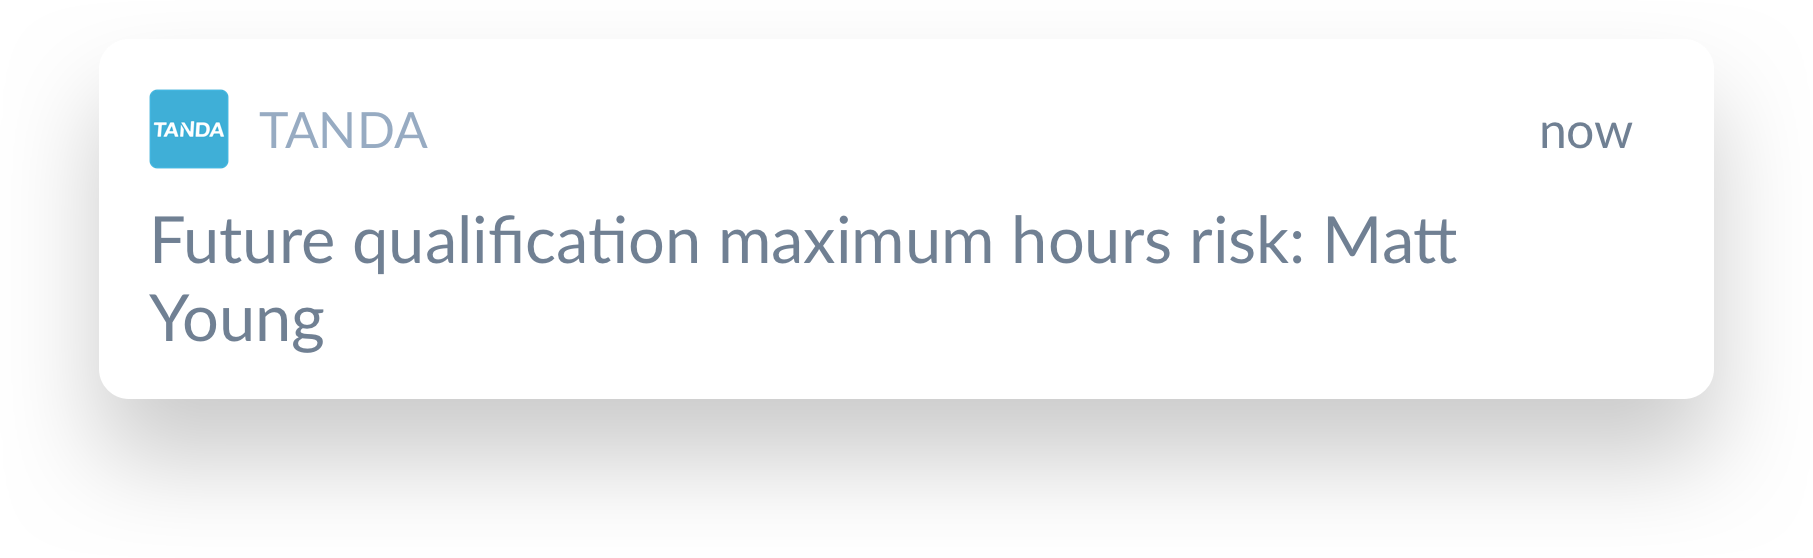 key alert max qualification hours